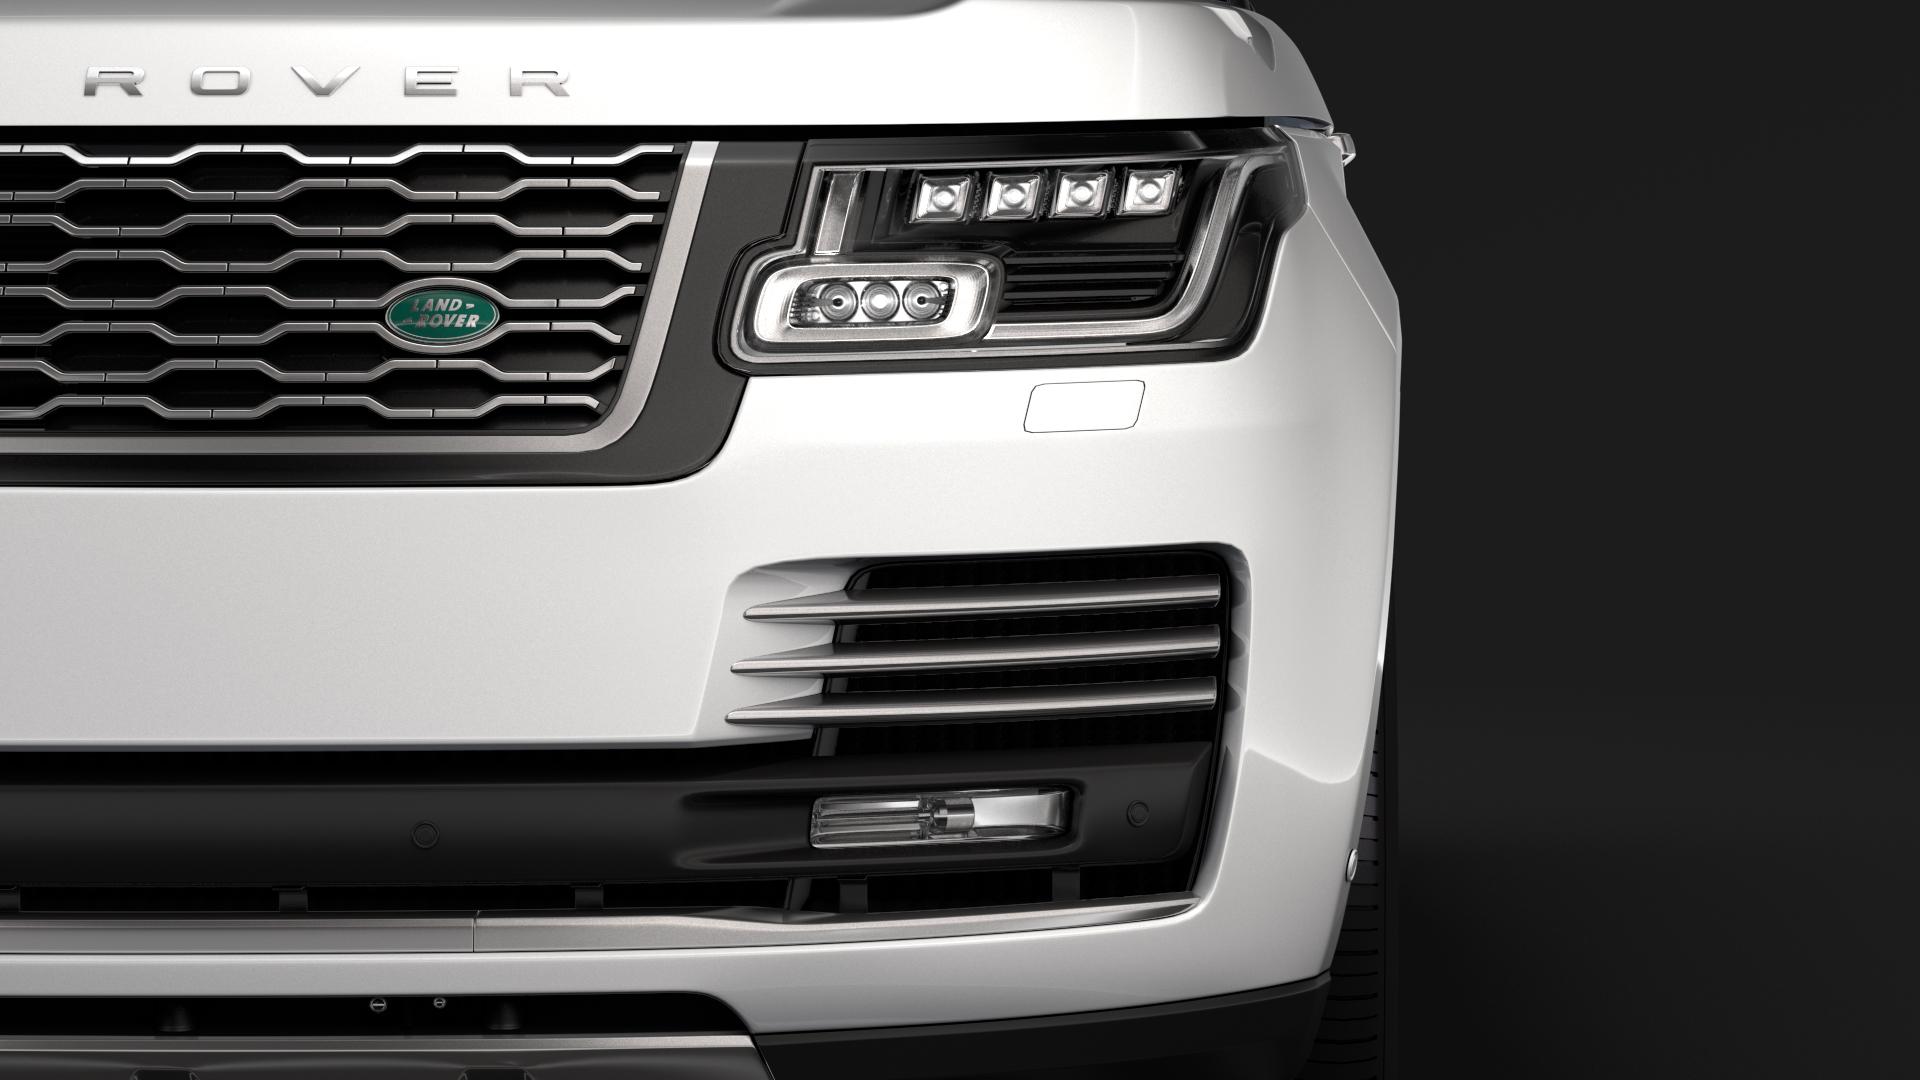 range rover autobiography p400e lwb l405 2018 3d model fbx c4d lwo ma mb hrc xsi obj 277354